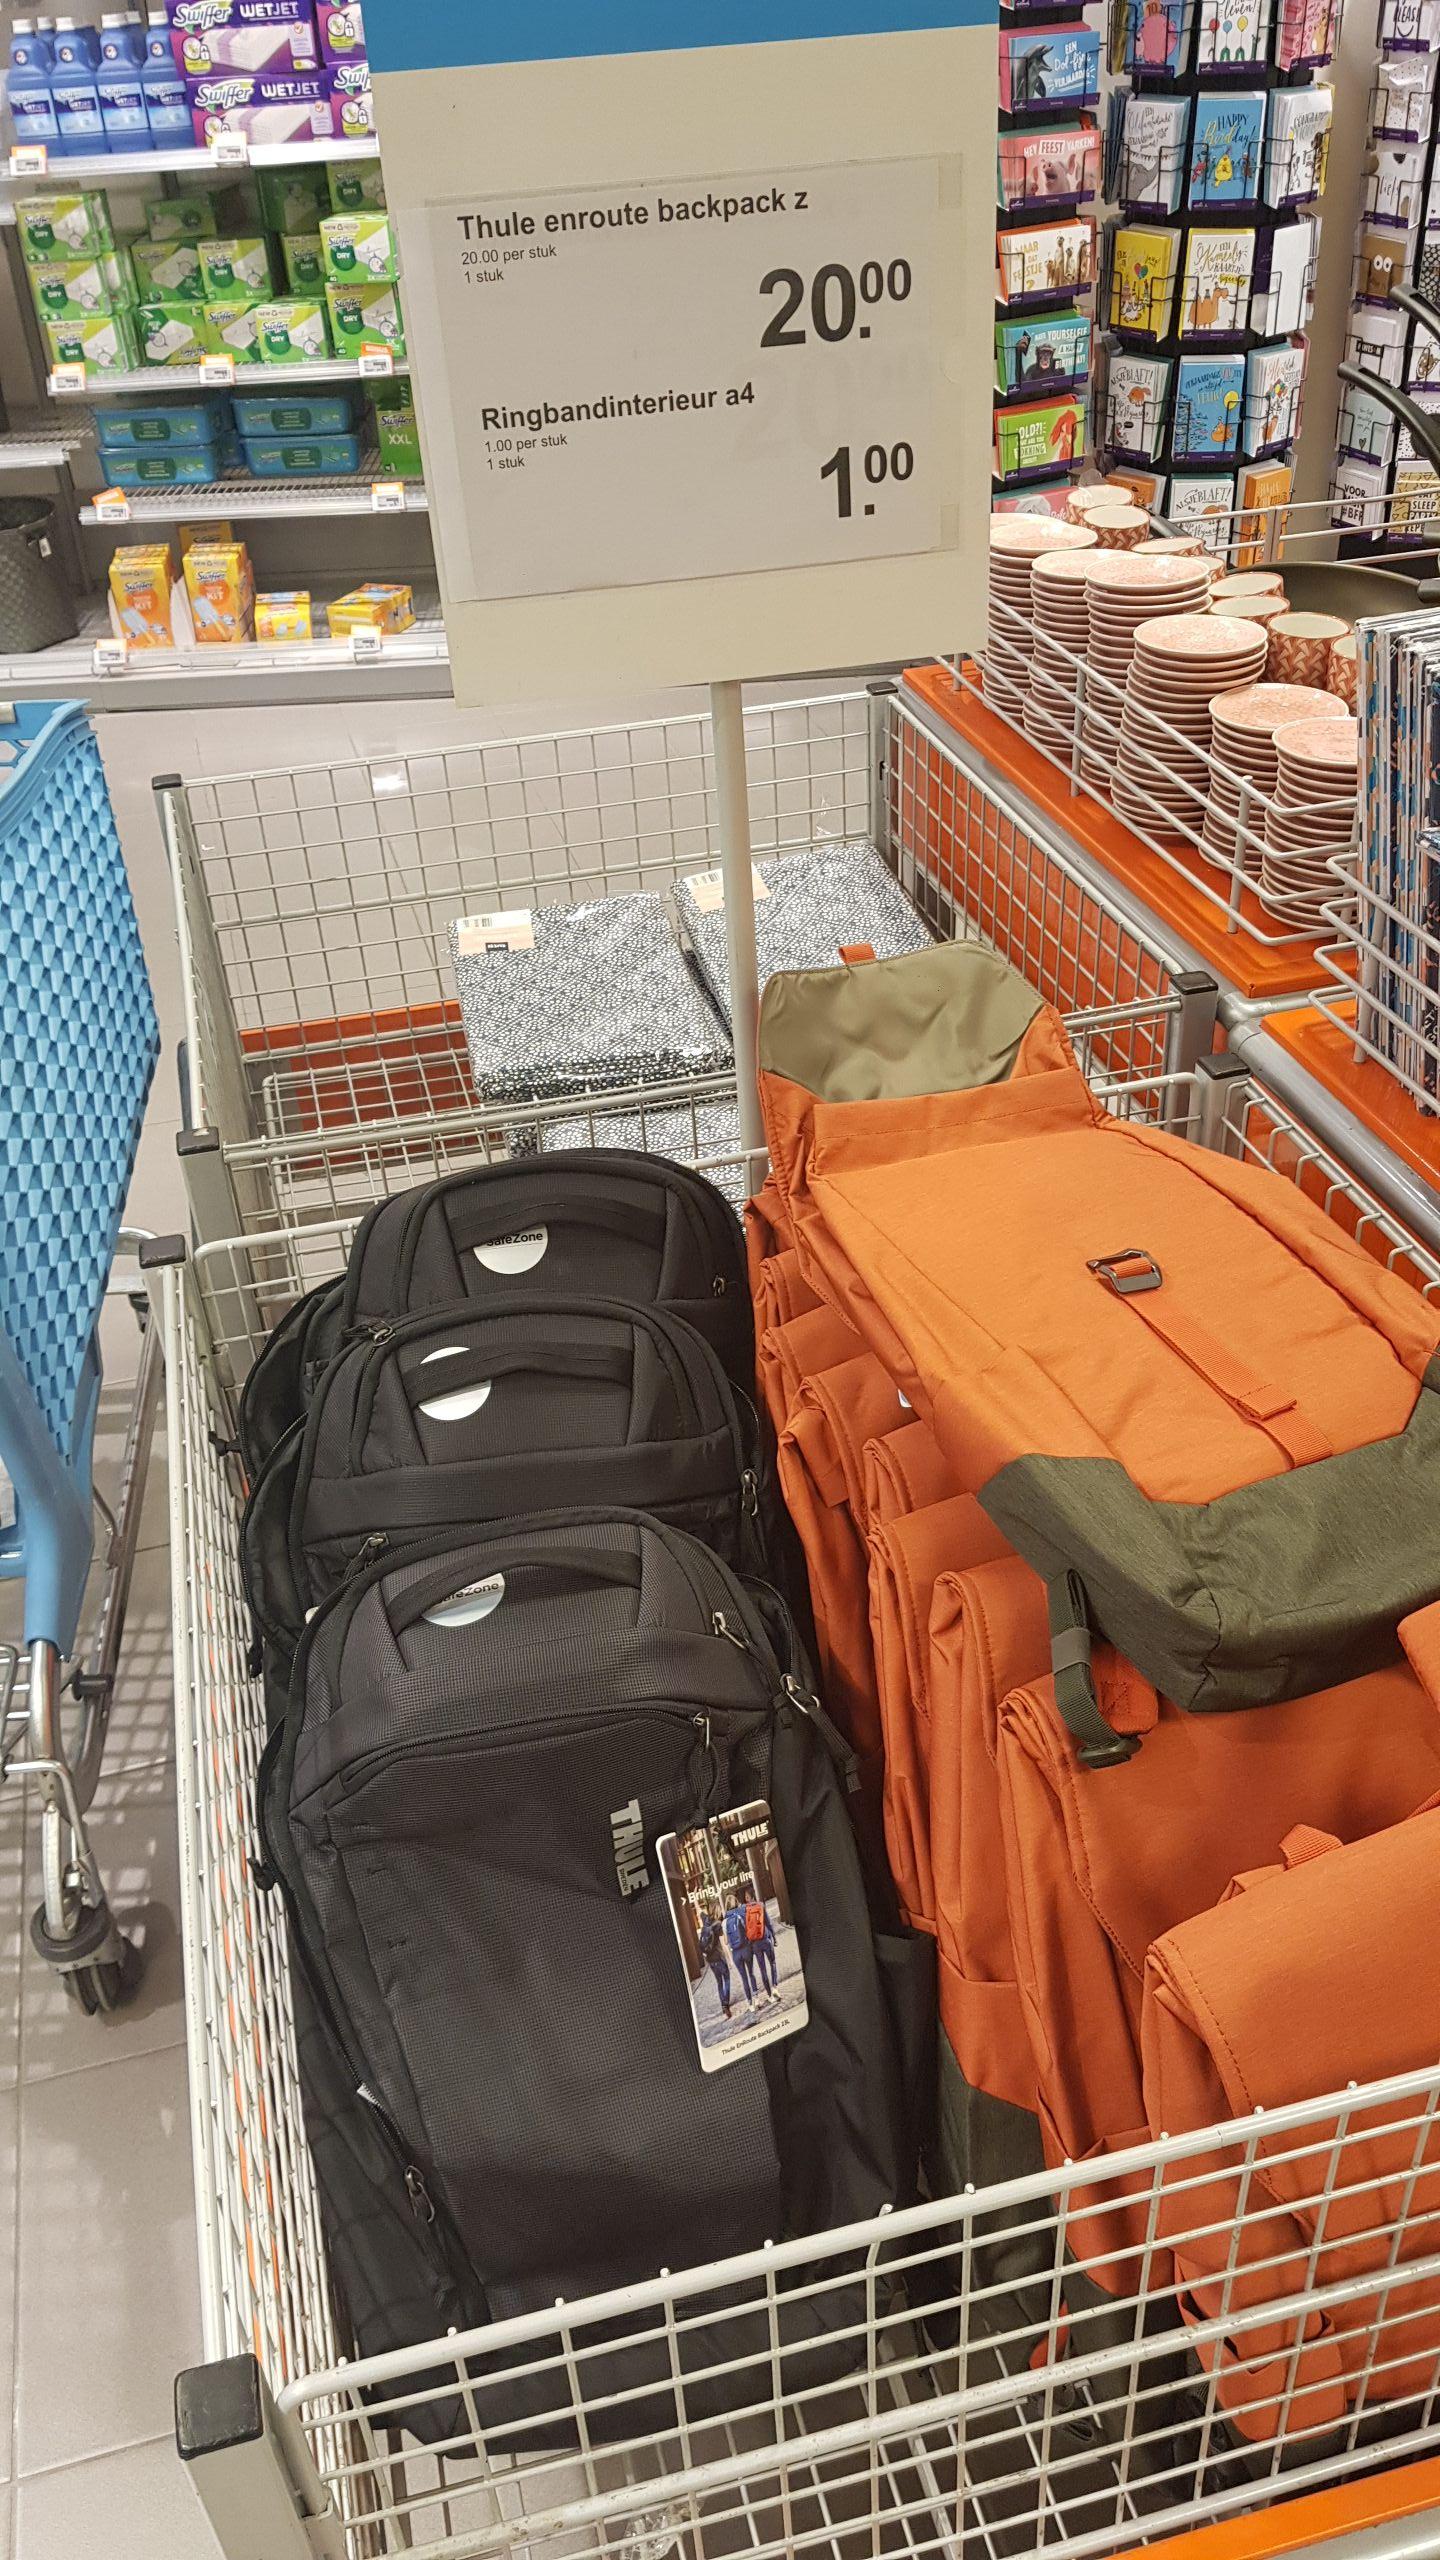 "[Lokaal?] Thule enroute 23L 15"" laptop rugzak bij AH XL Roermond"